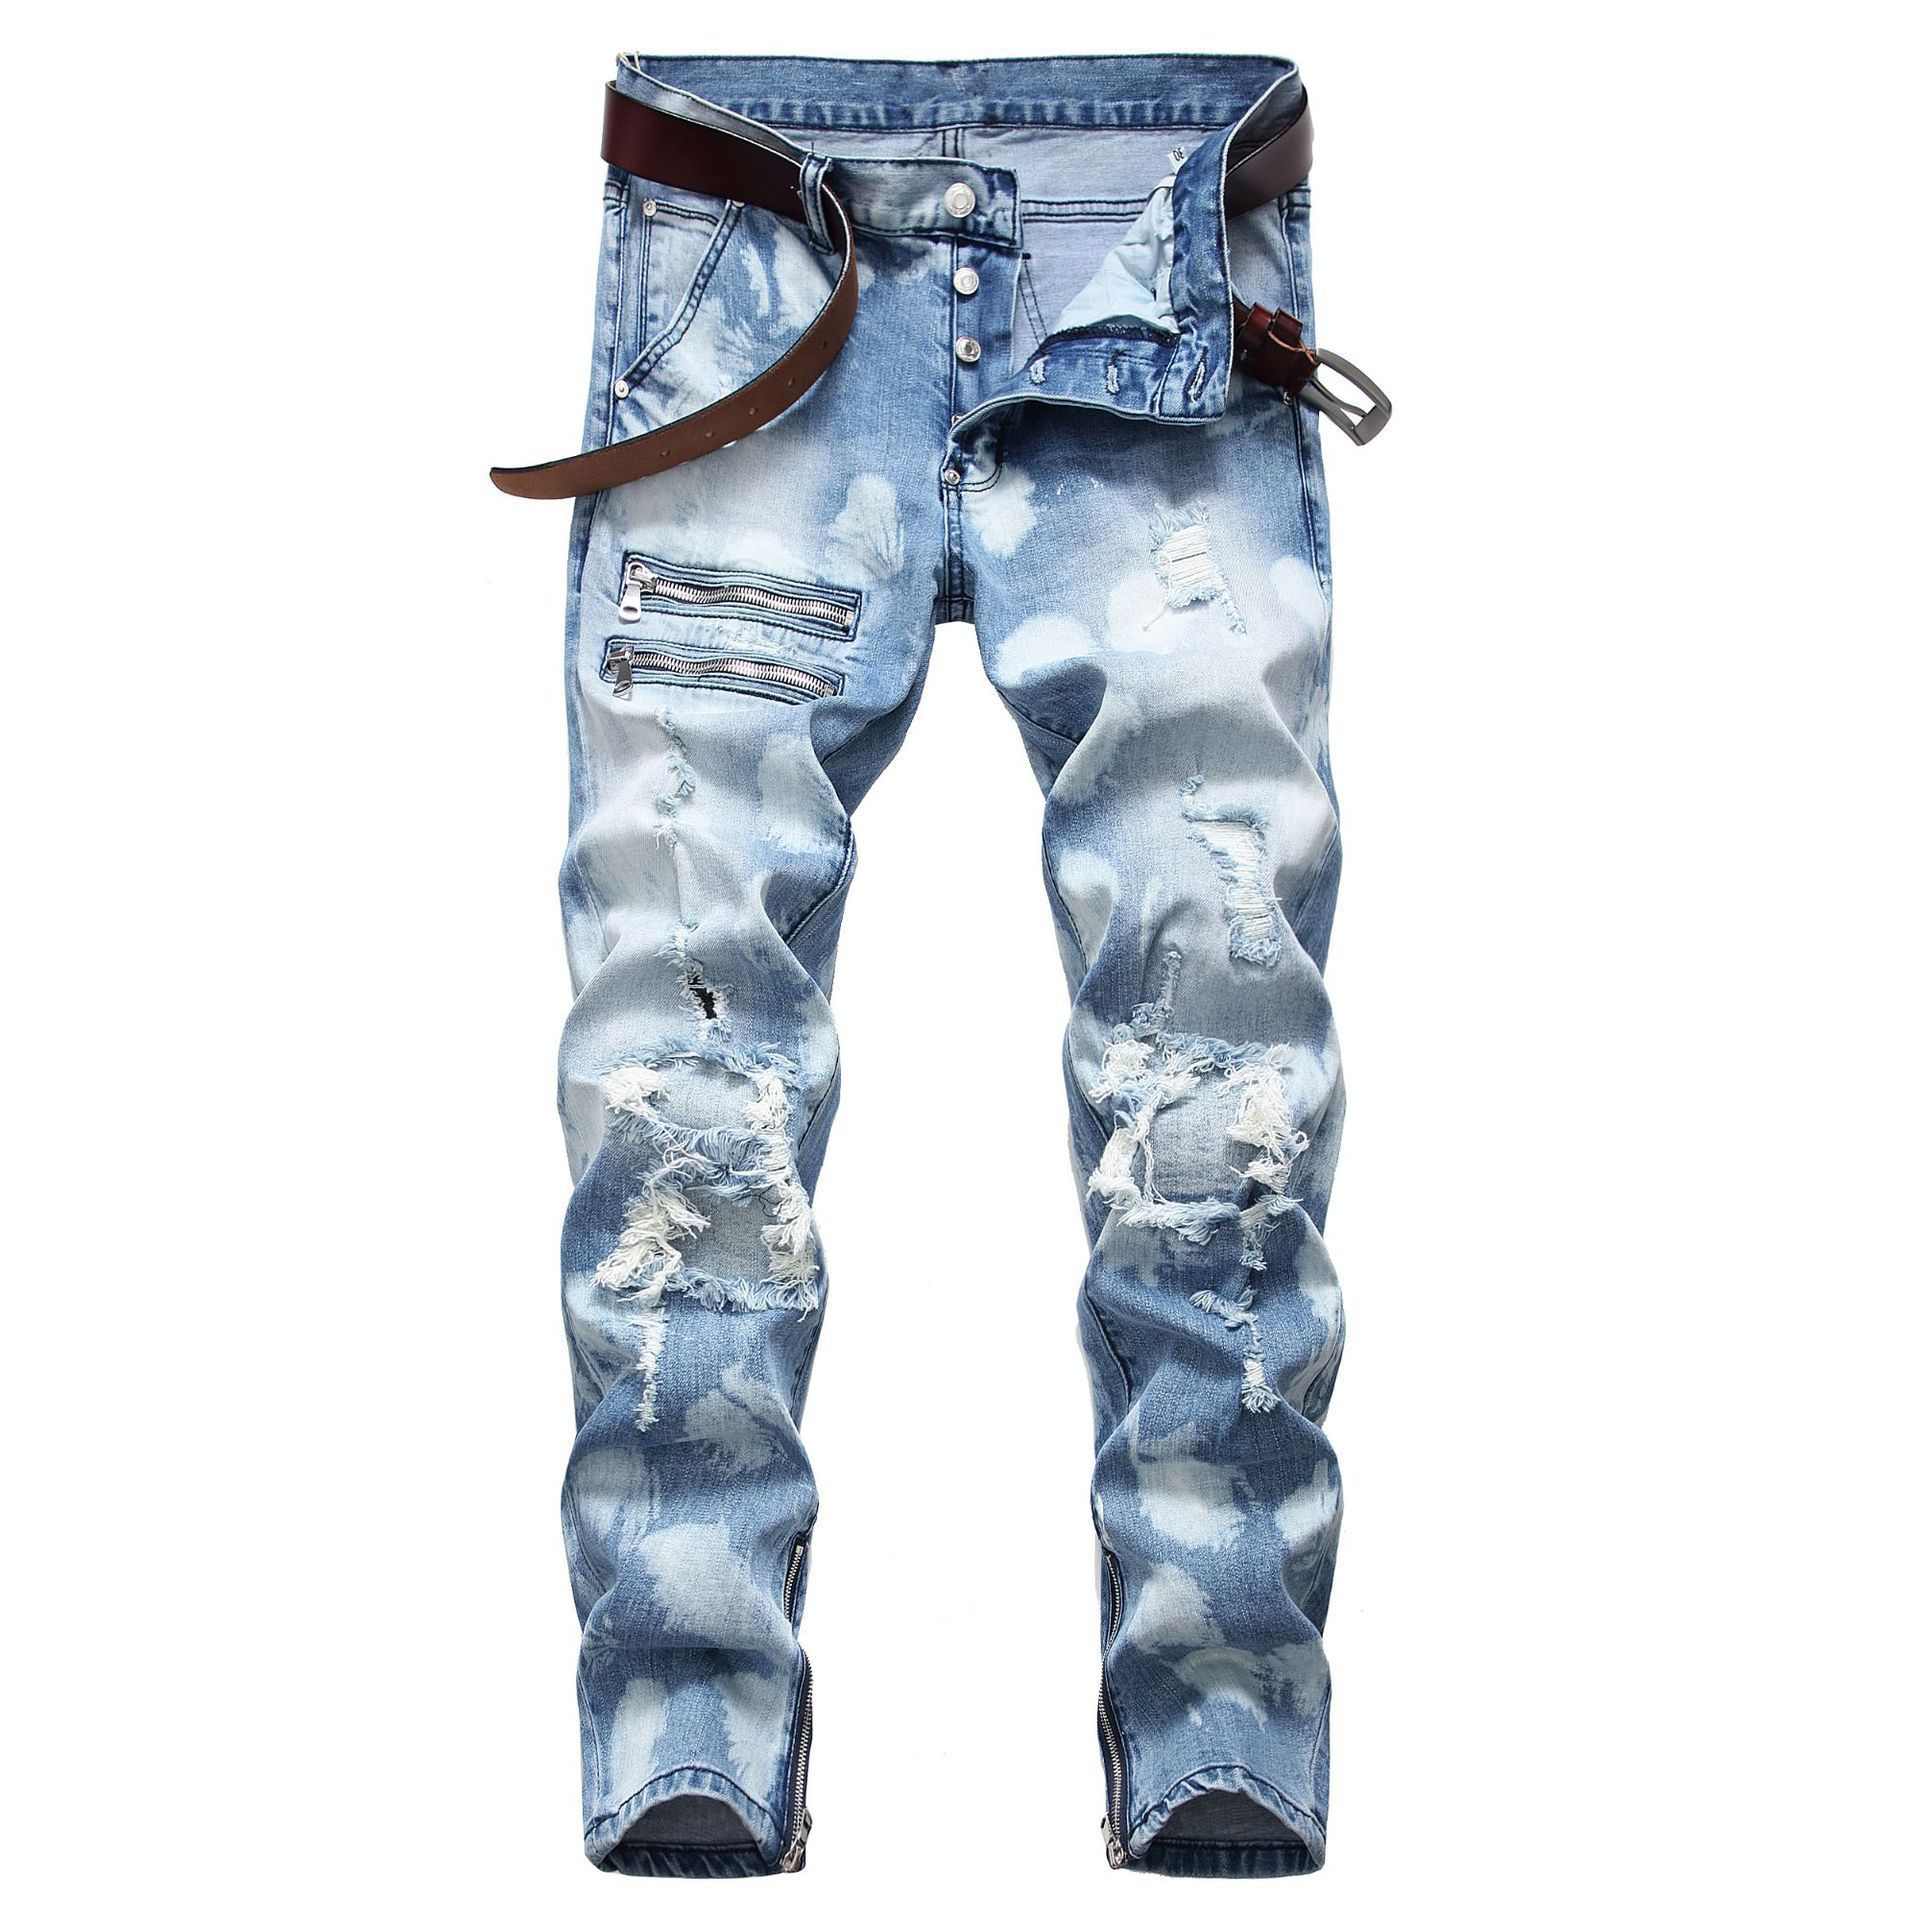 New Fashion Classic 2020 Men Ripped Jeans Biker Skinny Straight Denim Trousers Skinny Men Clothes